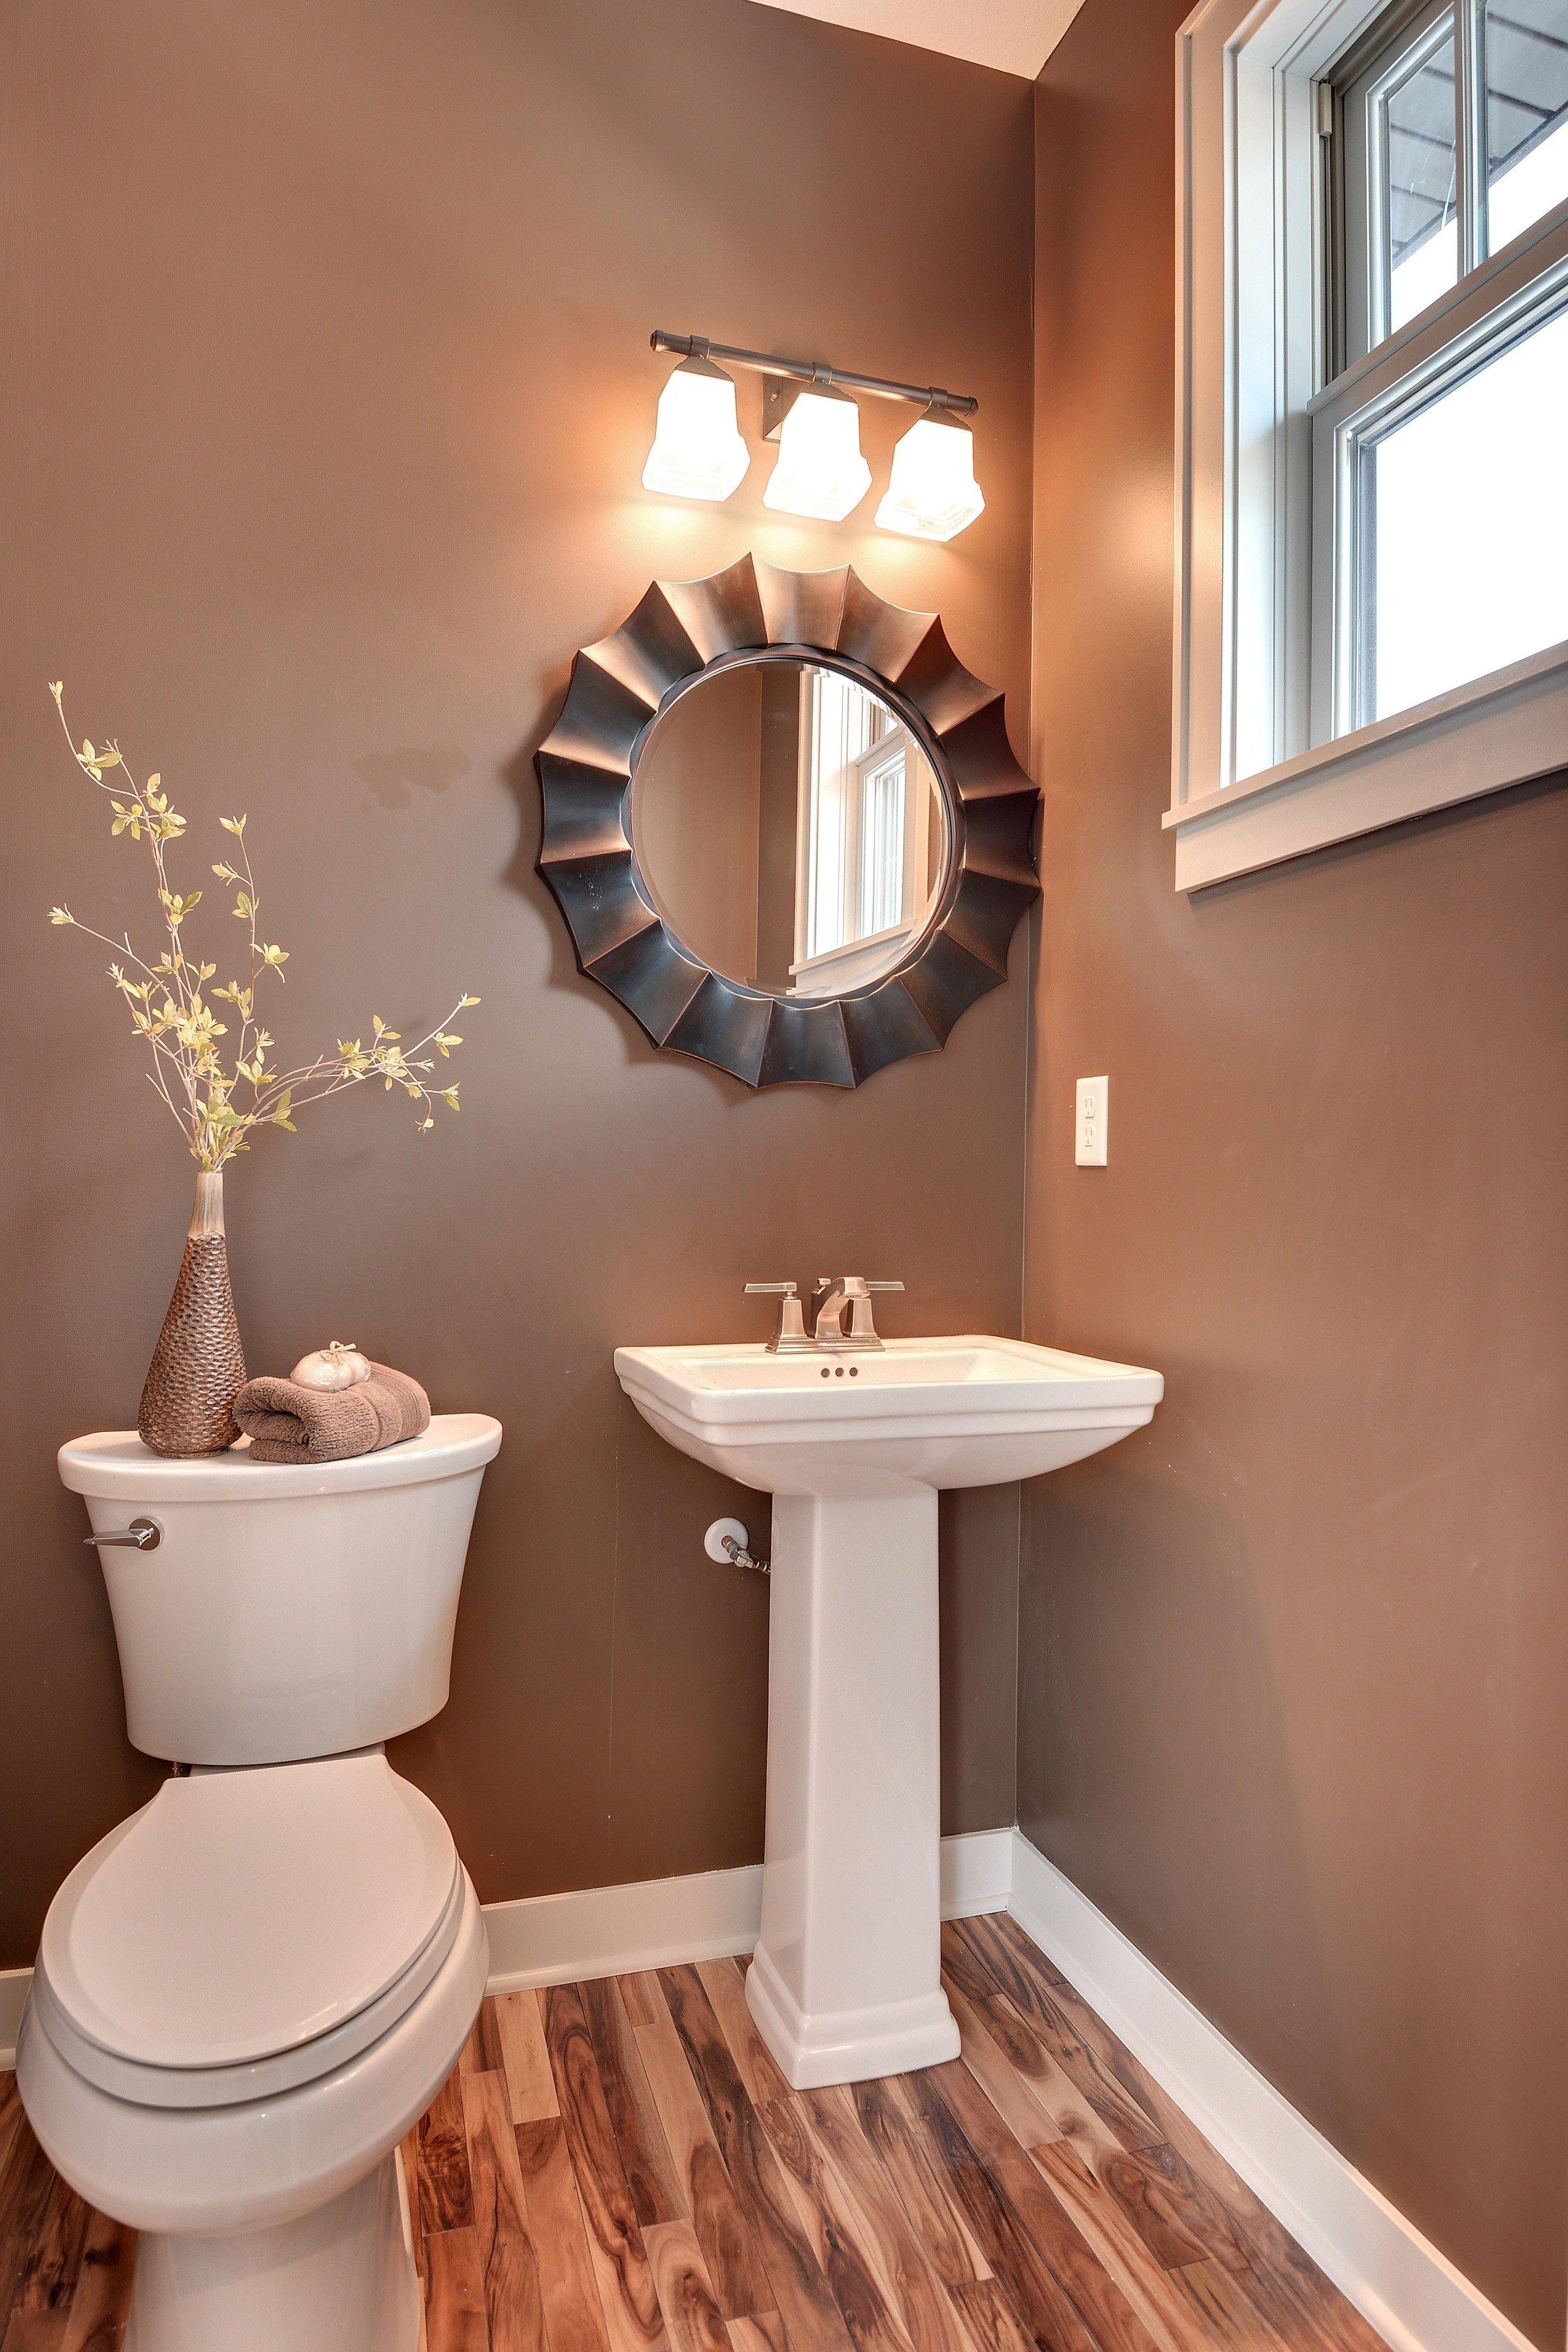 10 Attractive Small Bathroom Decorating Ideas Pictures astonishing bathroom decorating ideas for small bathrooms small